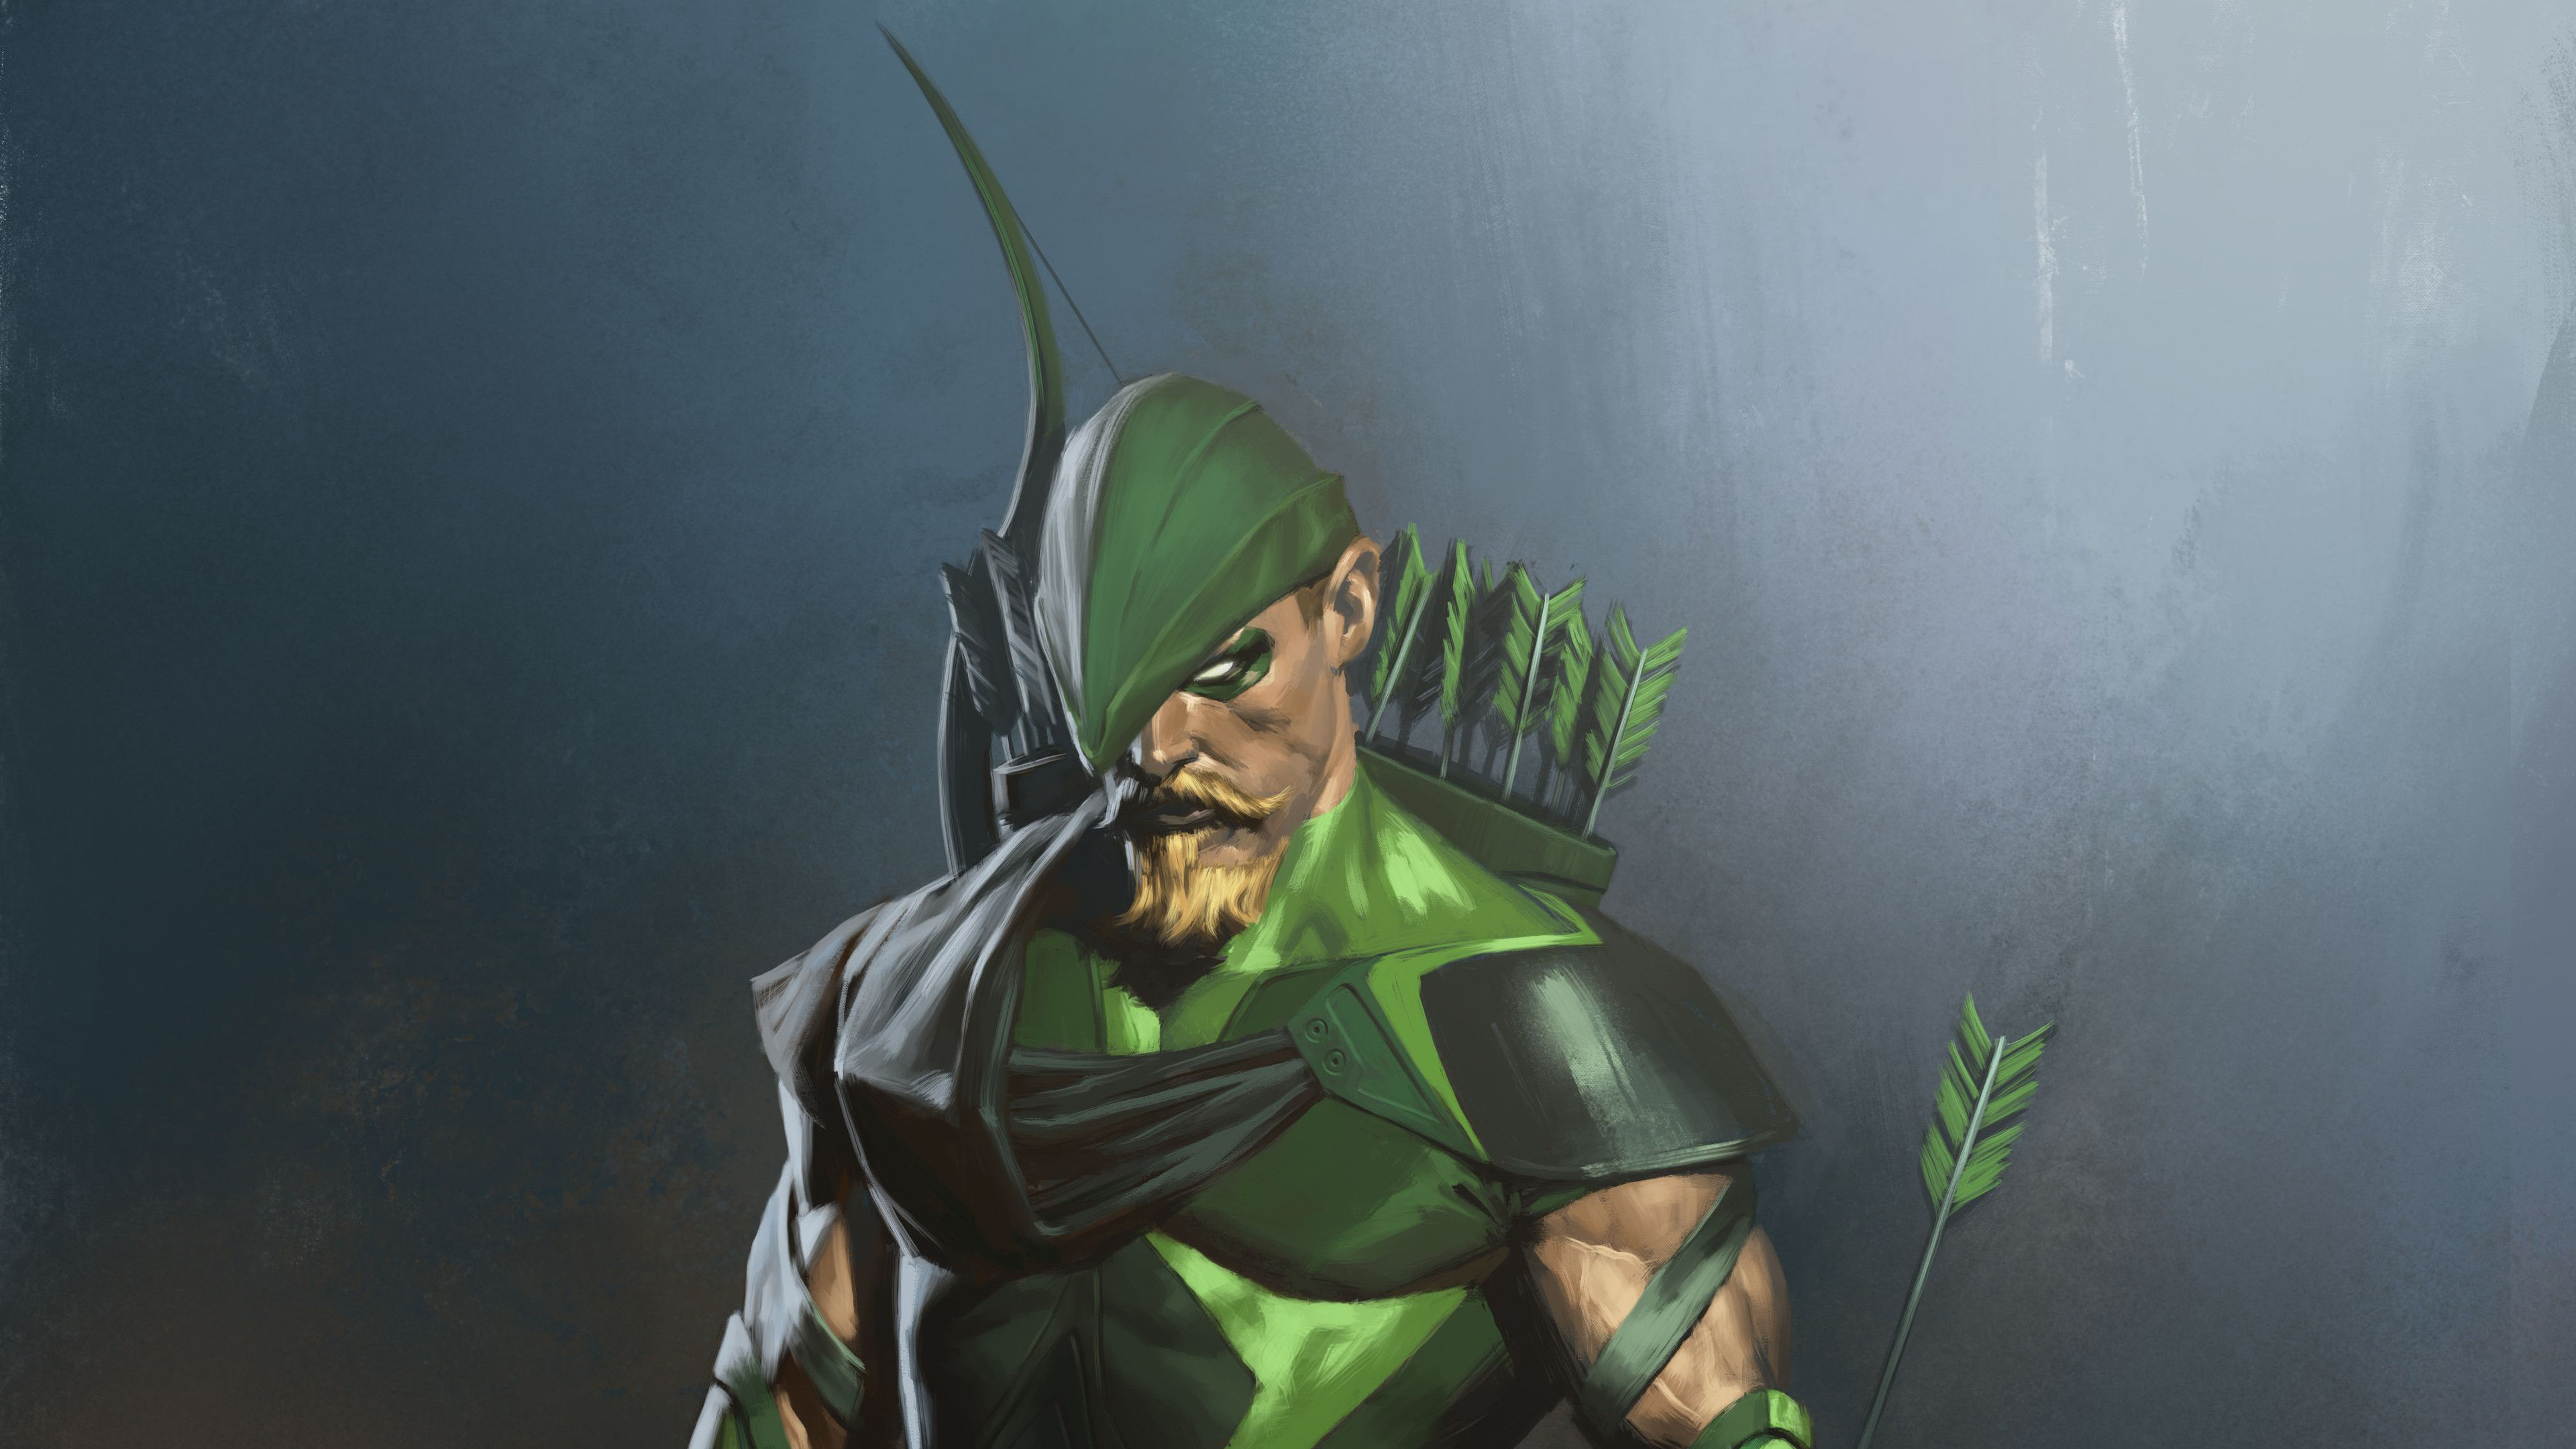 Green Arrow Injustice 2 Art 4k - Green Arrow Injustice 2 Comic - HD Wallpaper